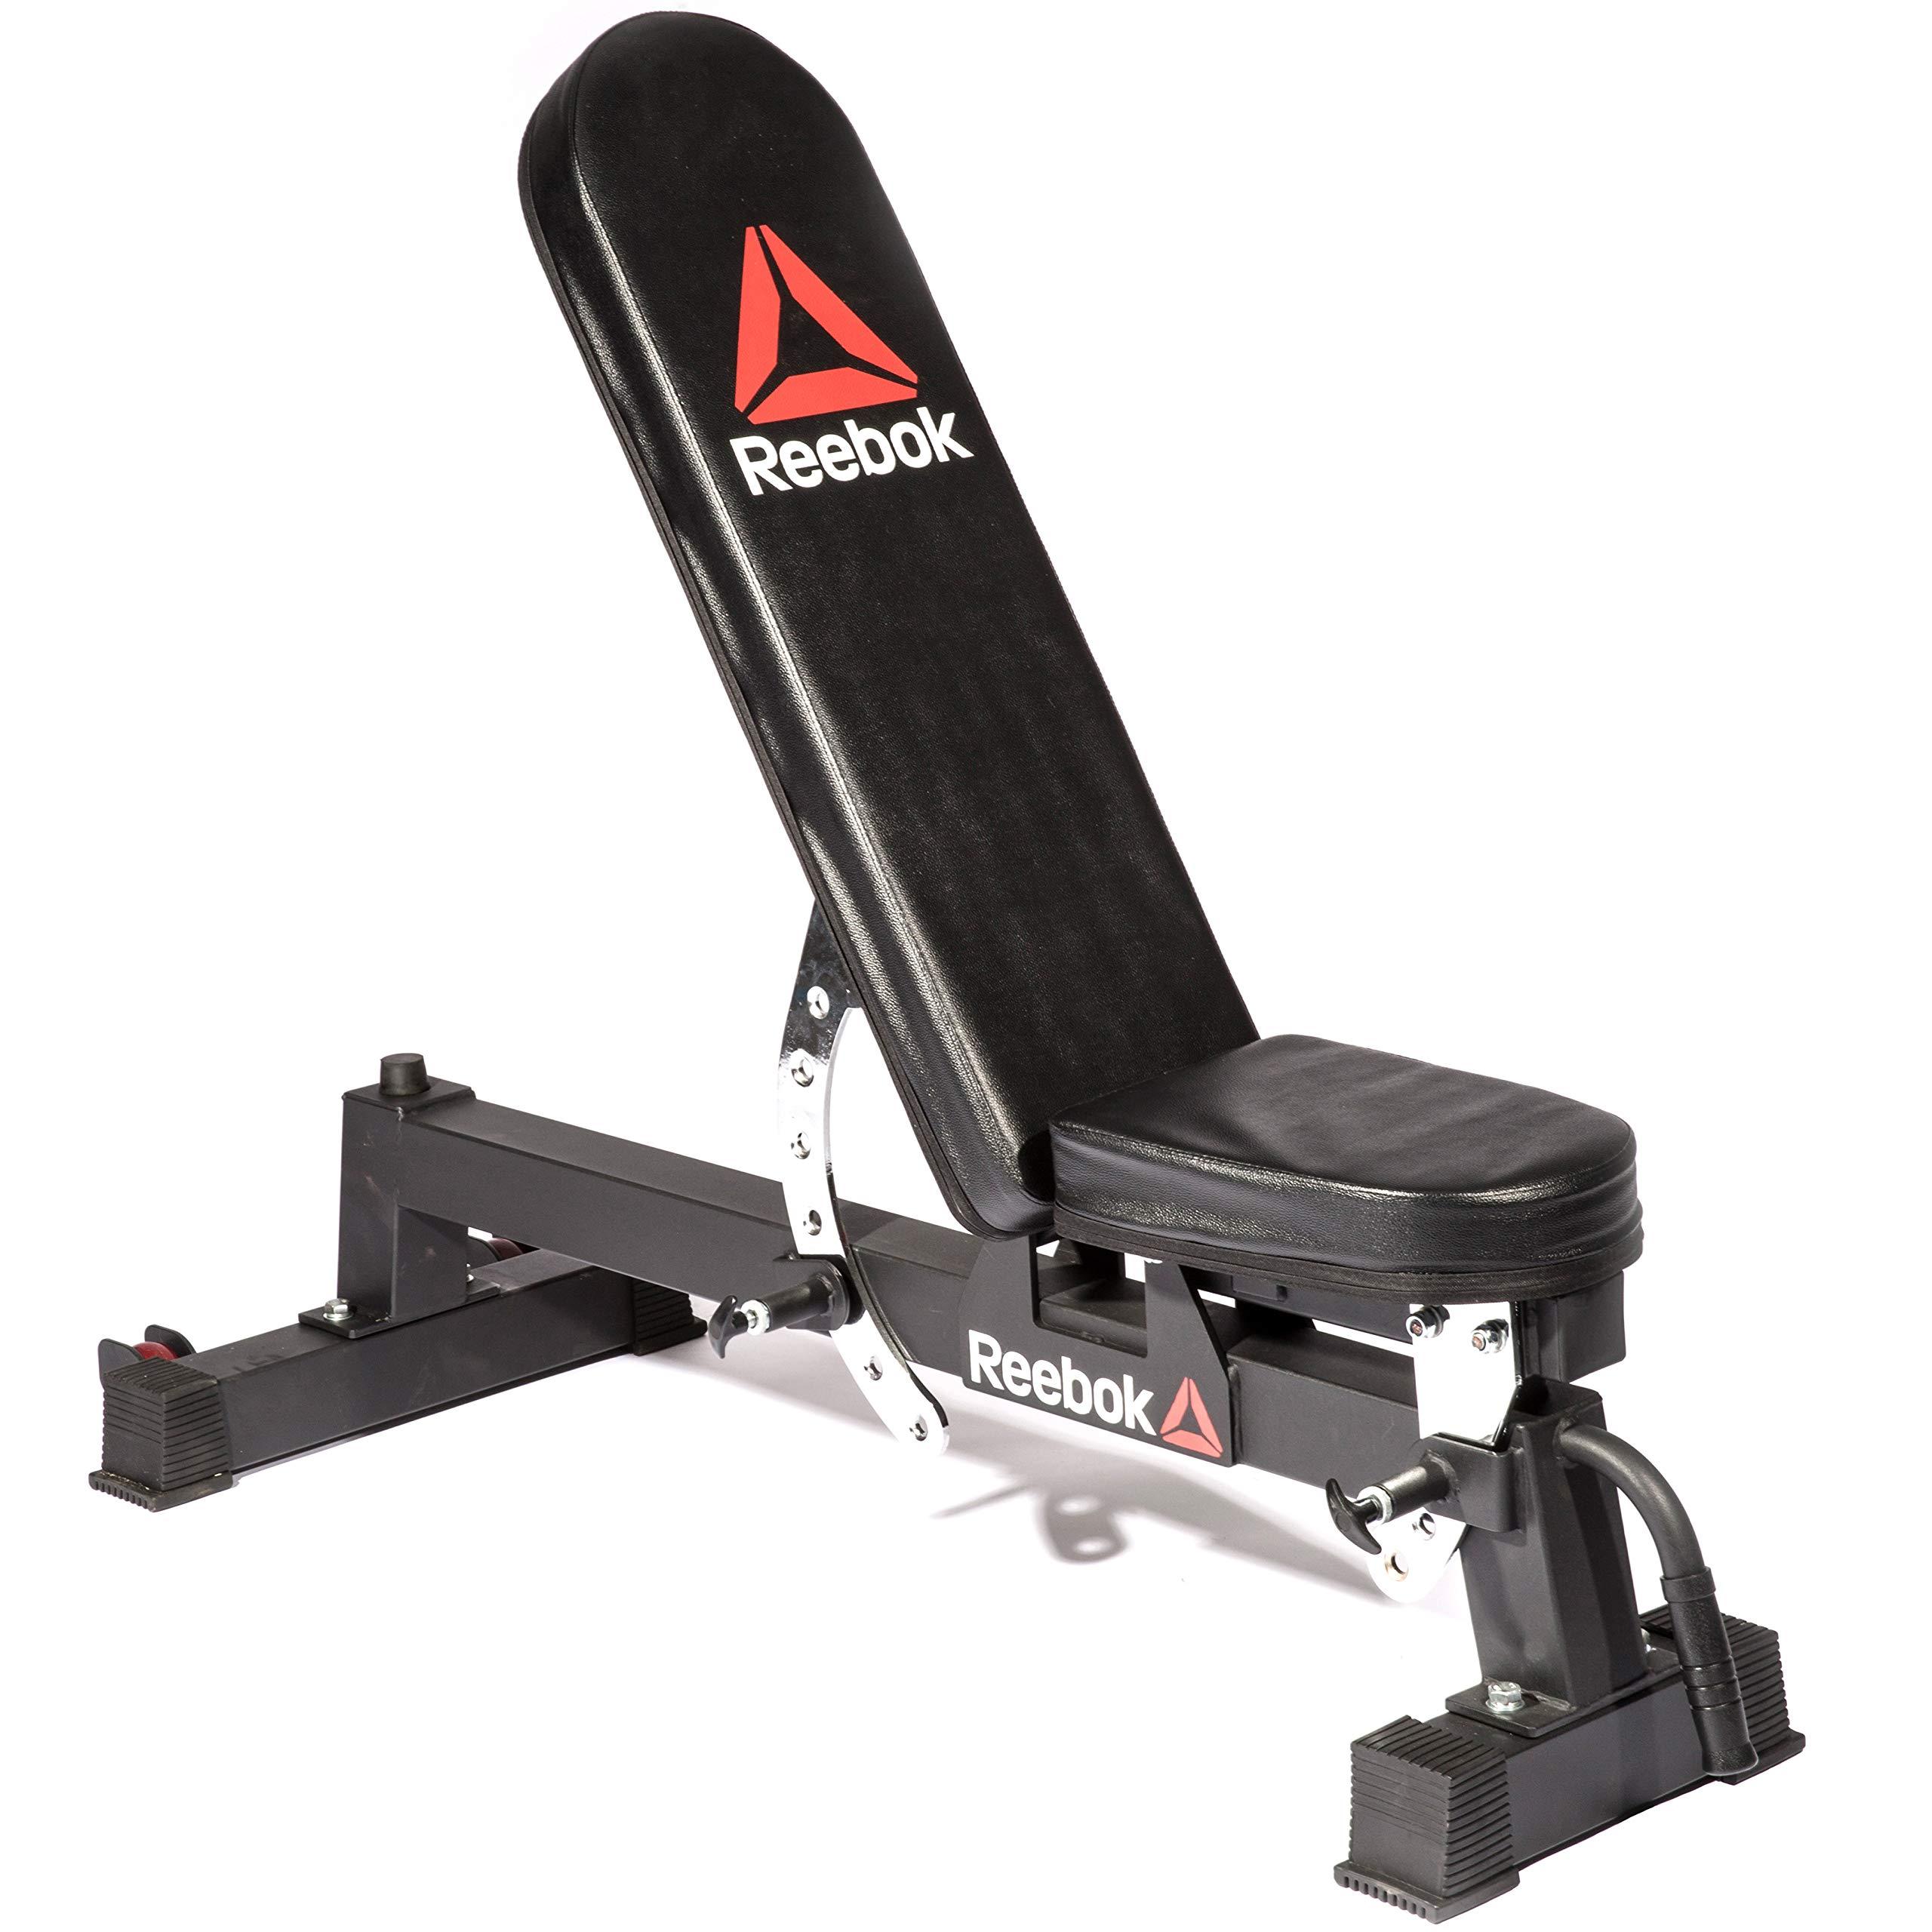 Reebok Pro Utility Bench by Reebok Fitness